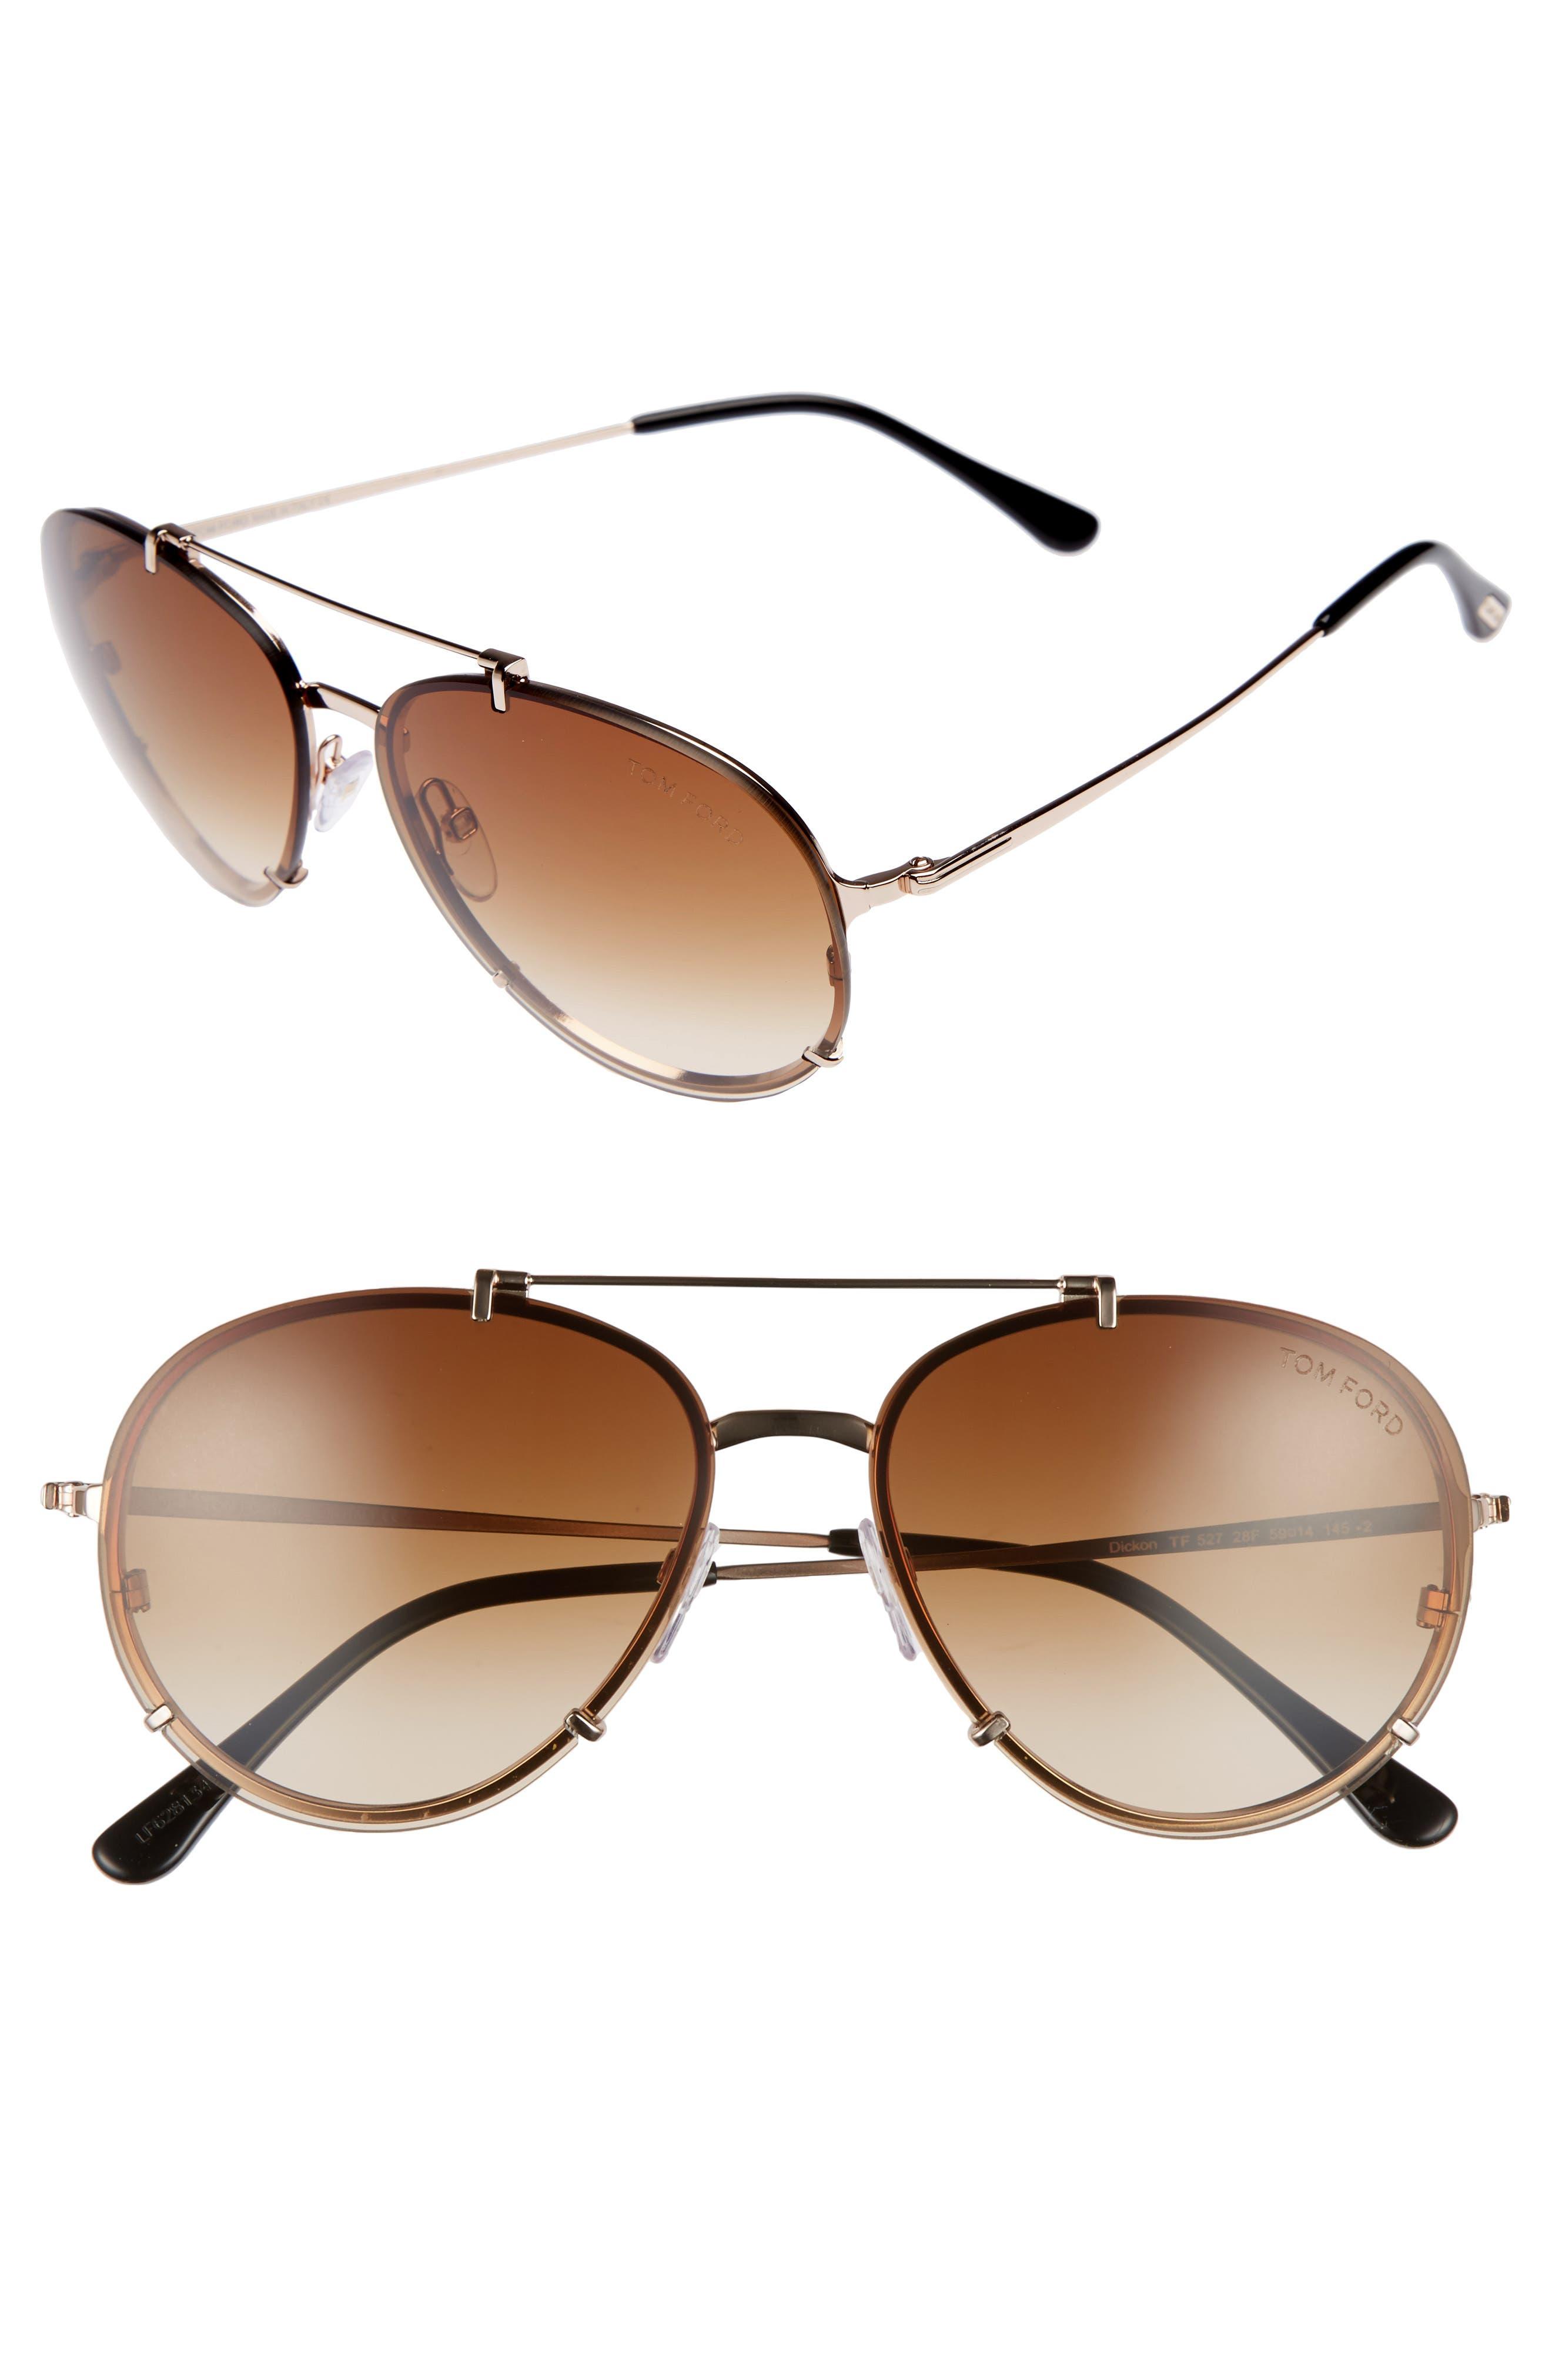 Alternate Image 1 Selected - Tom Ford Dickon 59mm Aviator Sunglasses